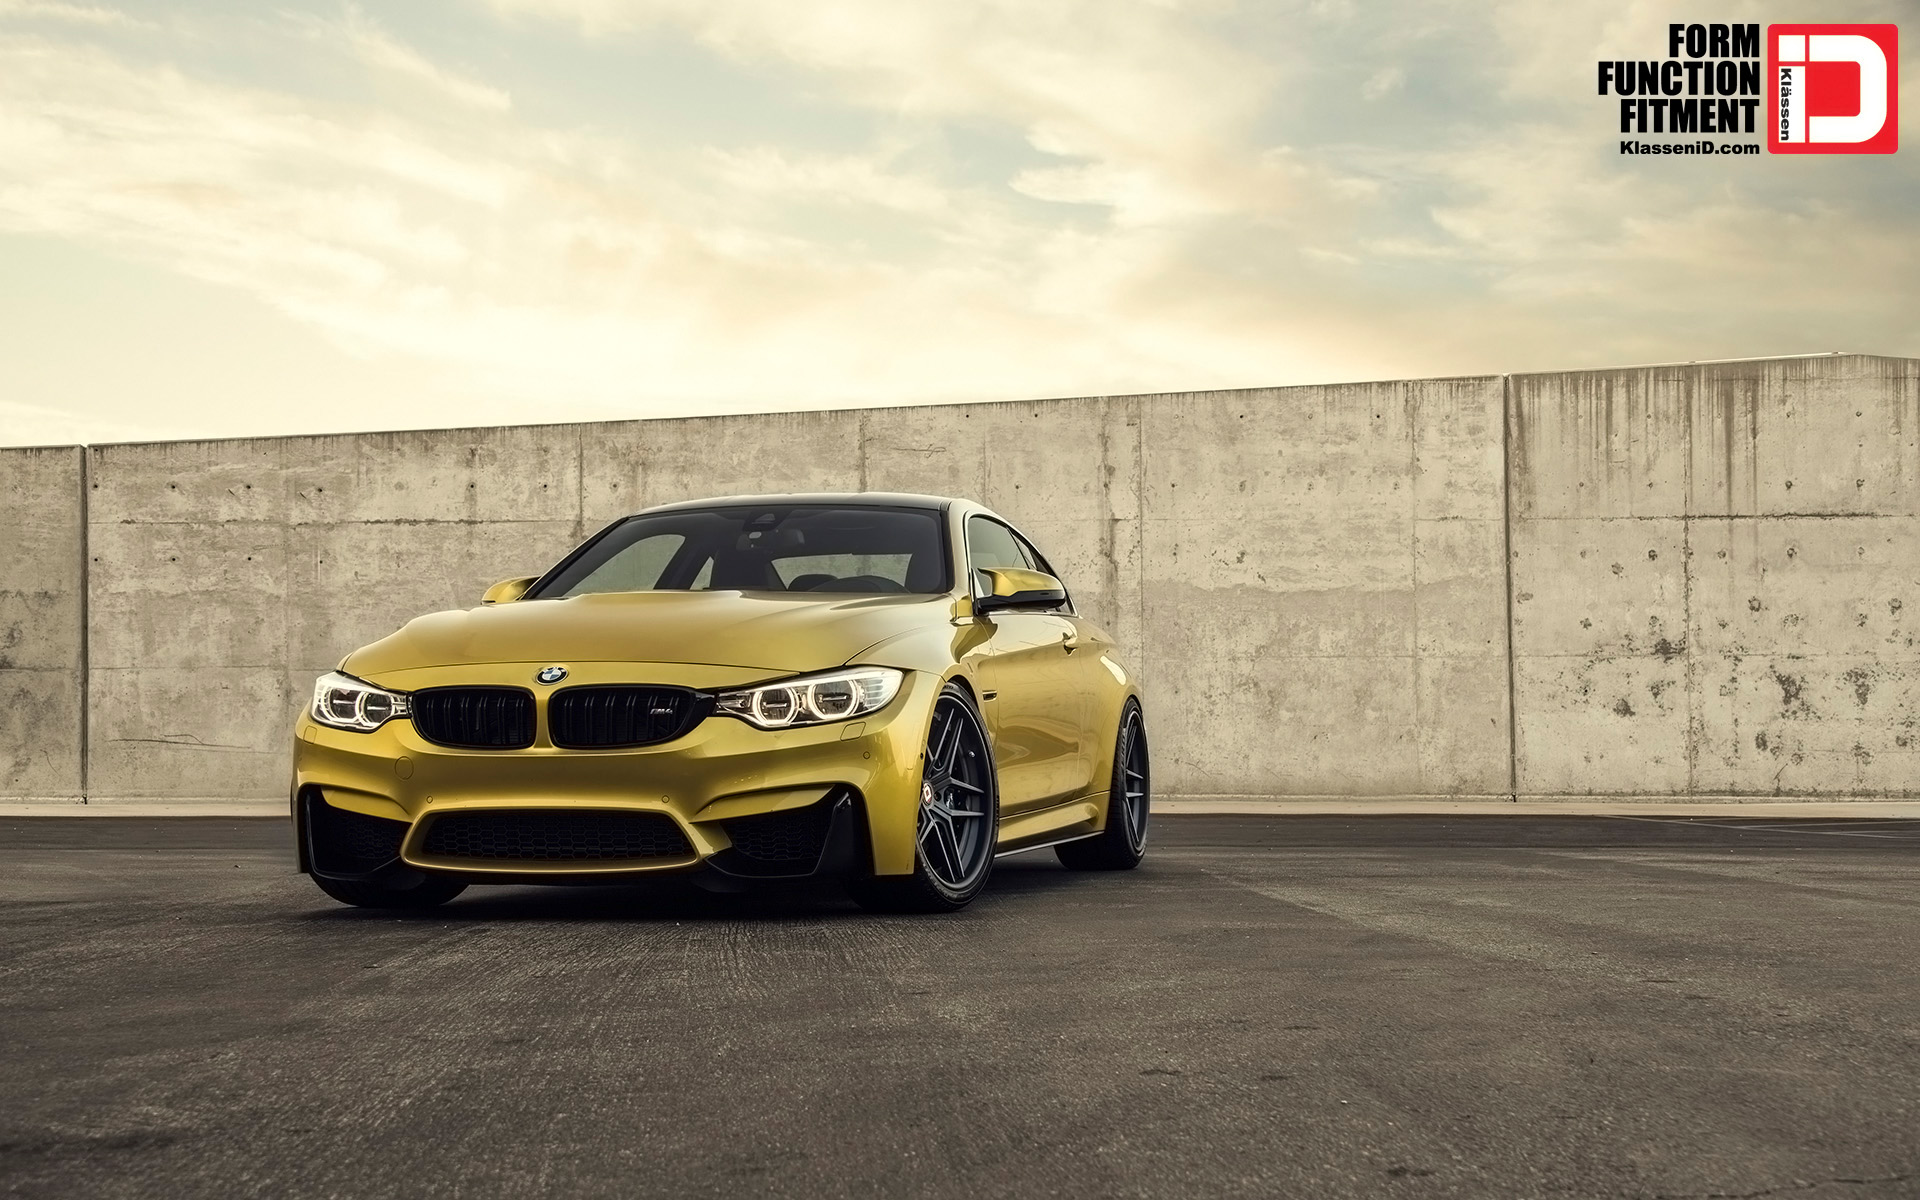 2015 Klassen BMW M4